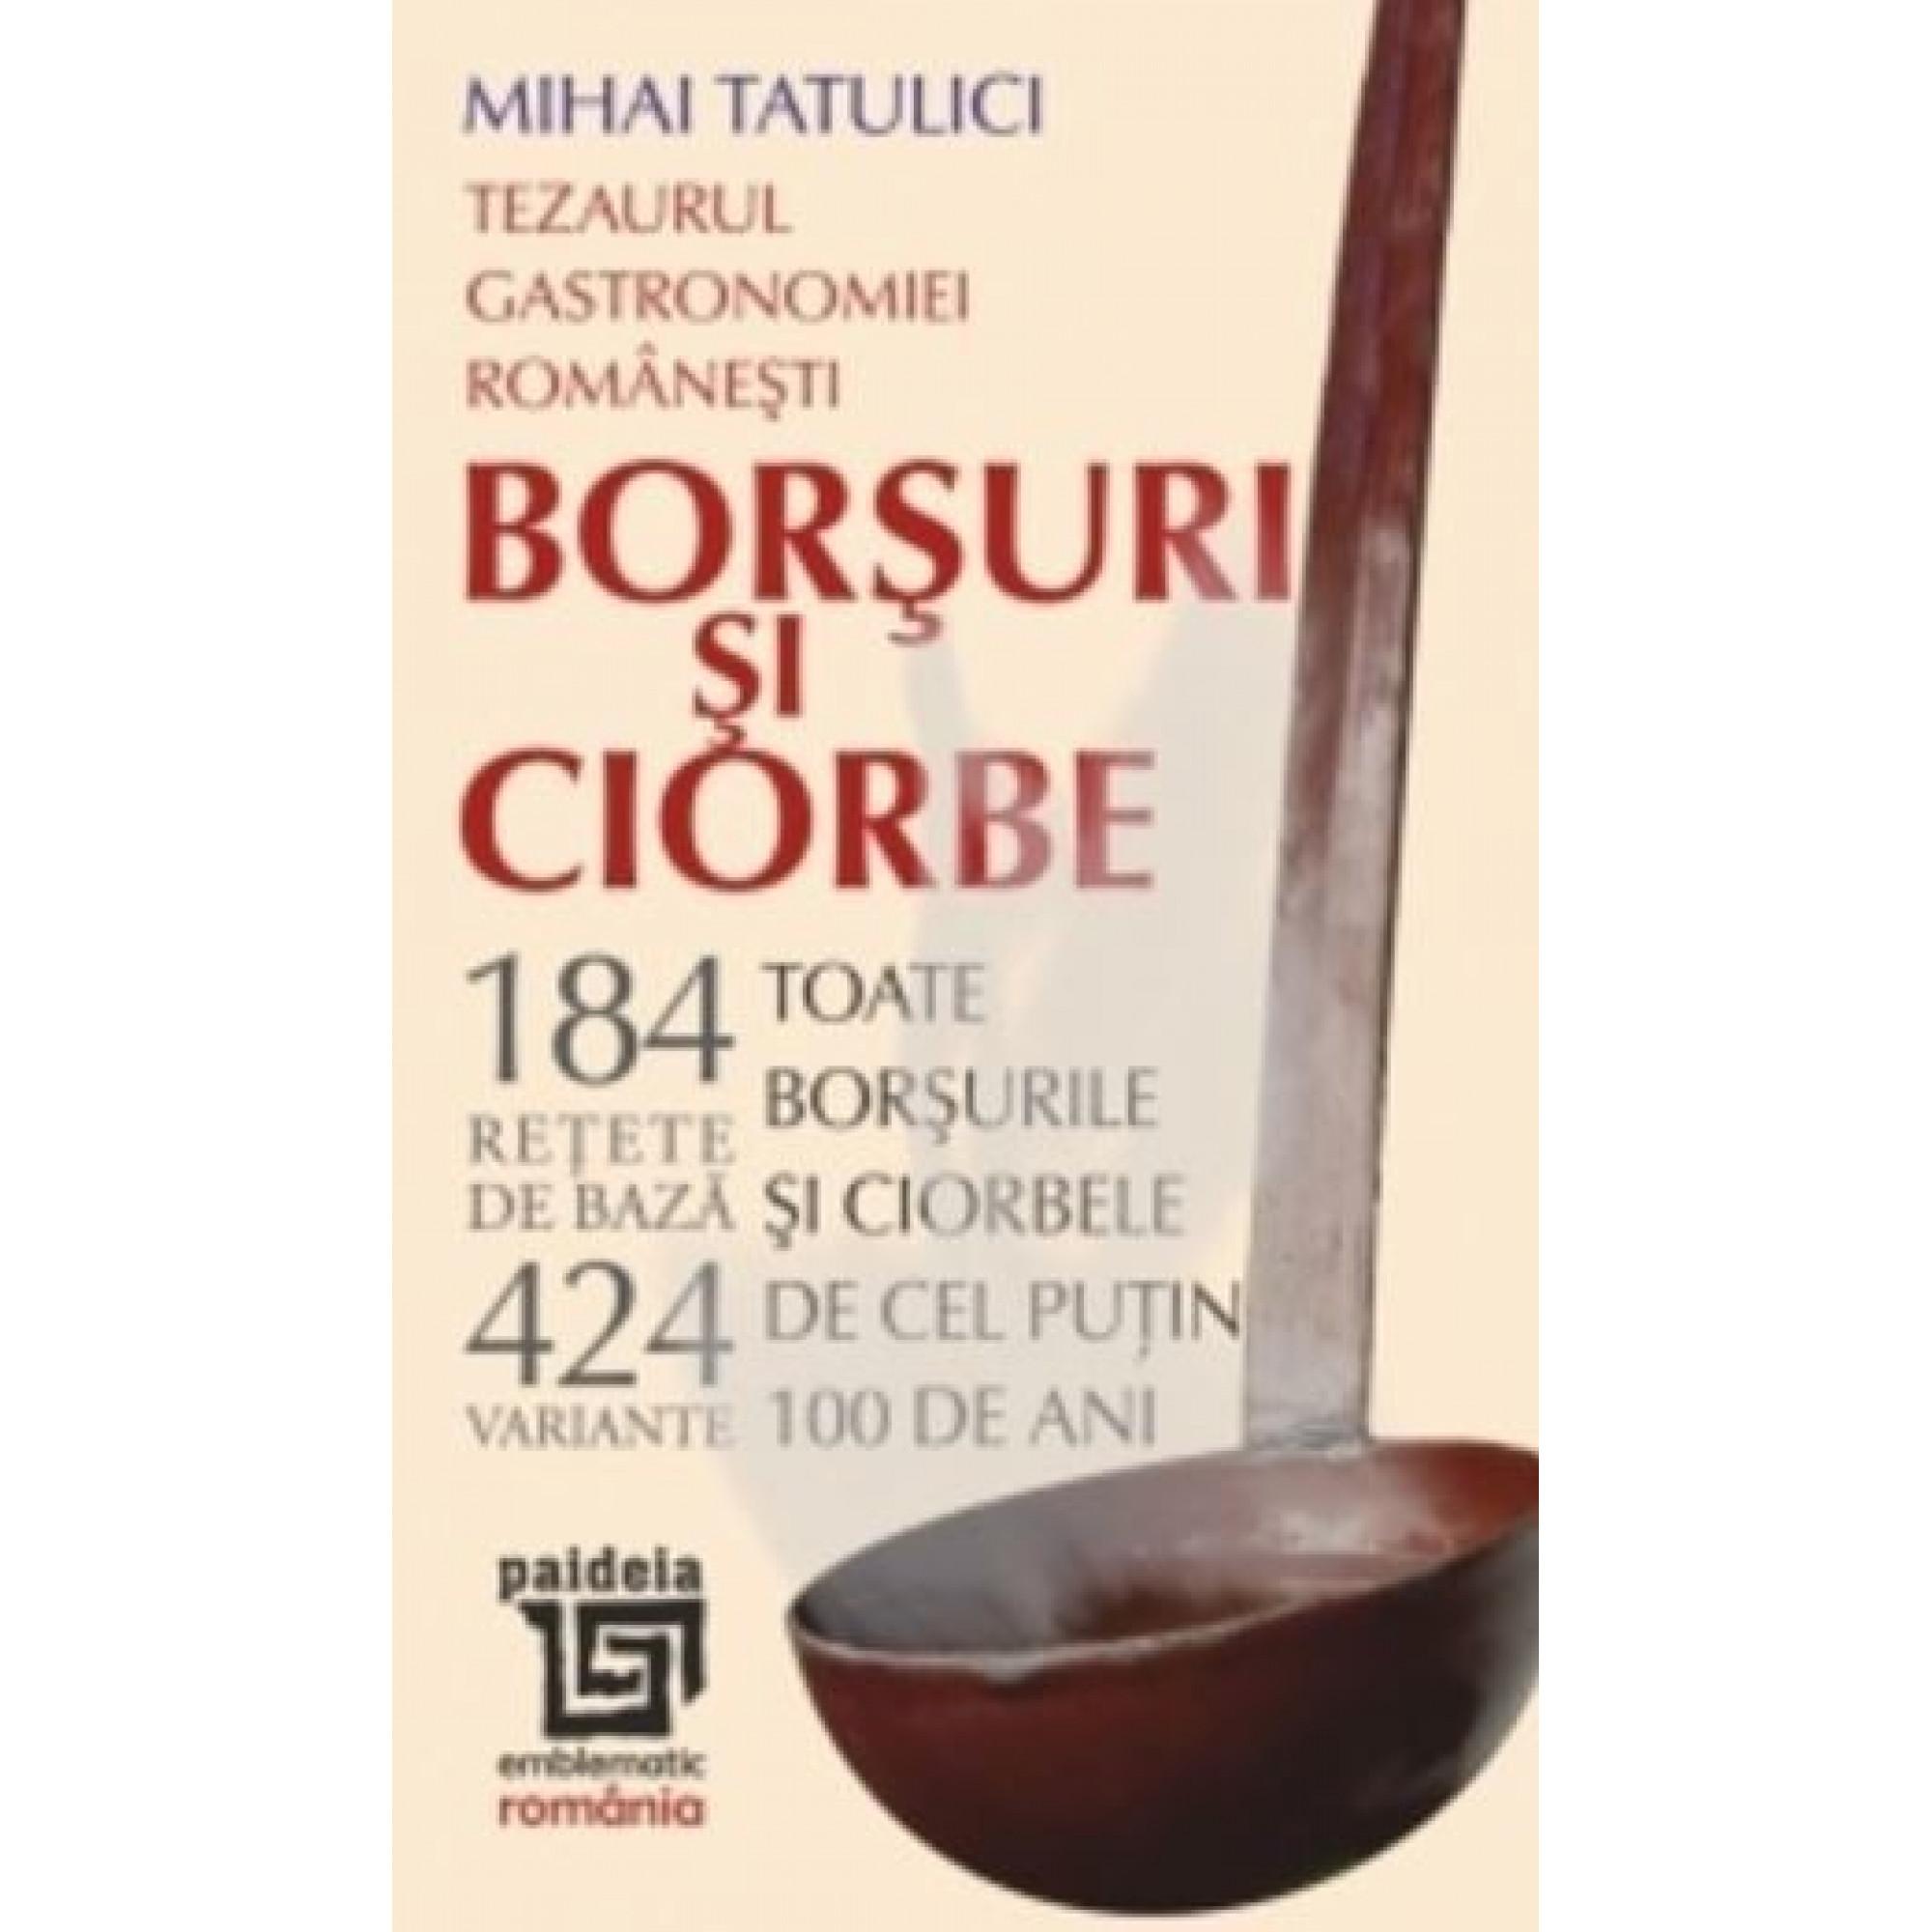 Tezaurul gastronomiei românești. Borșuri și ciorbe